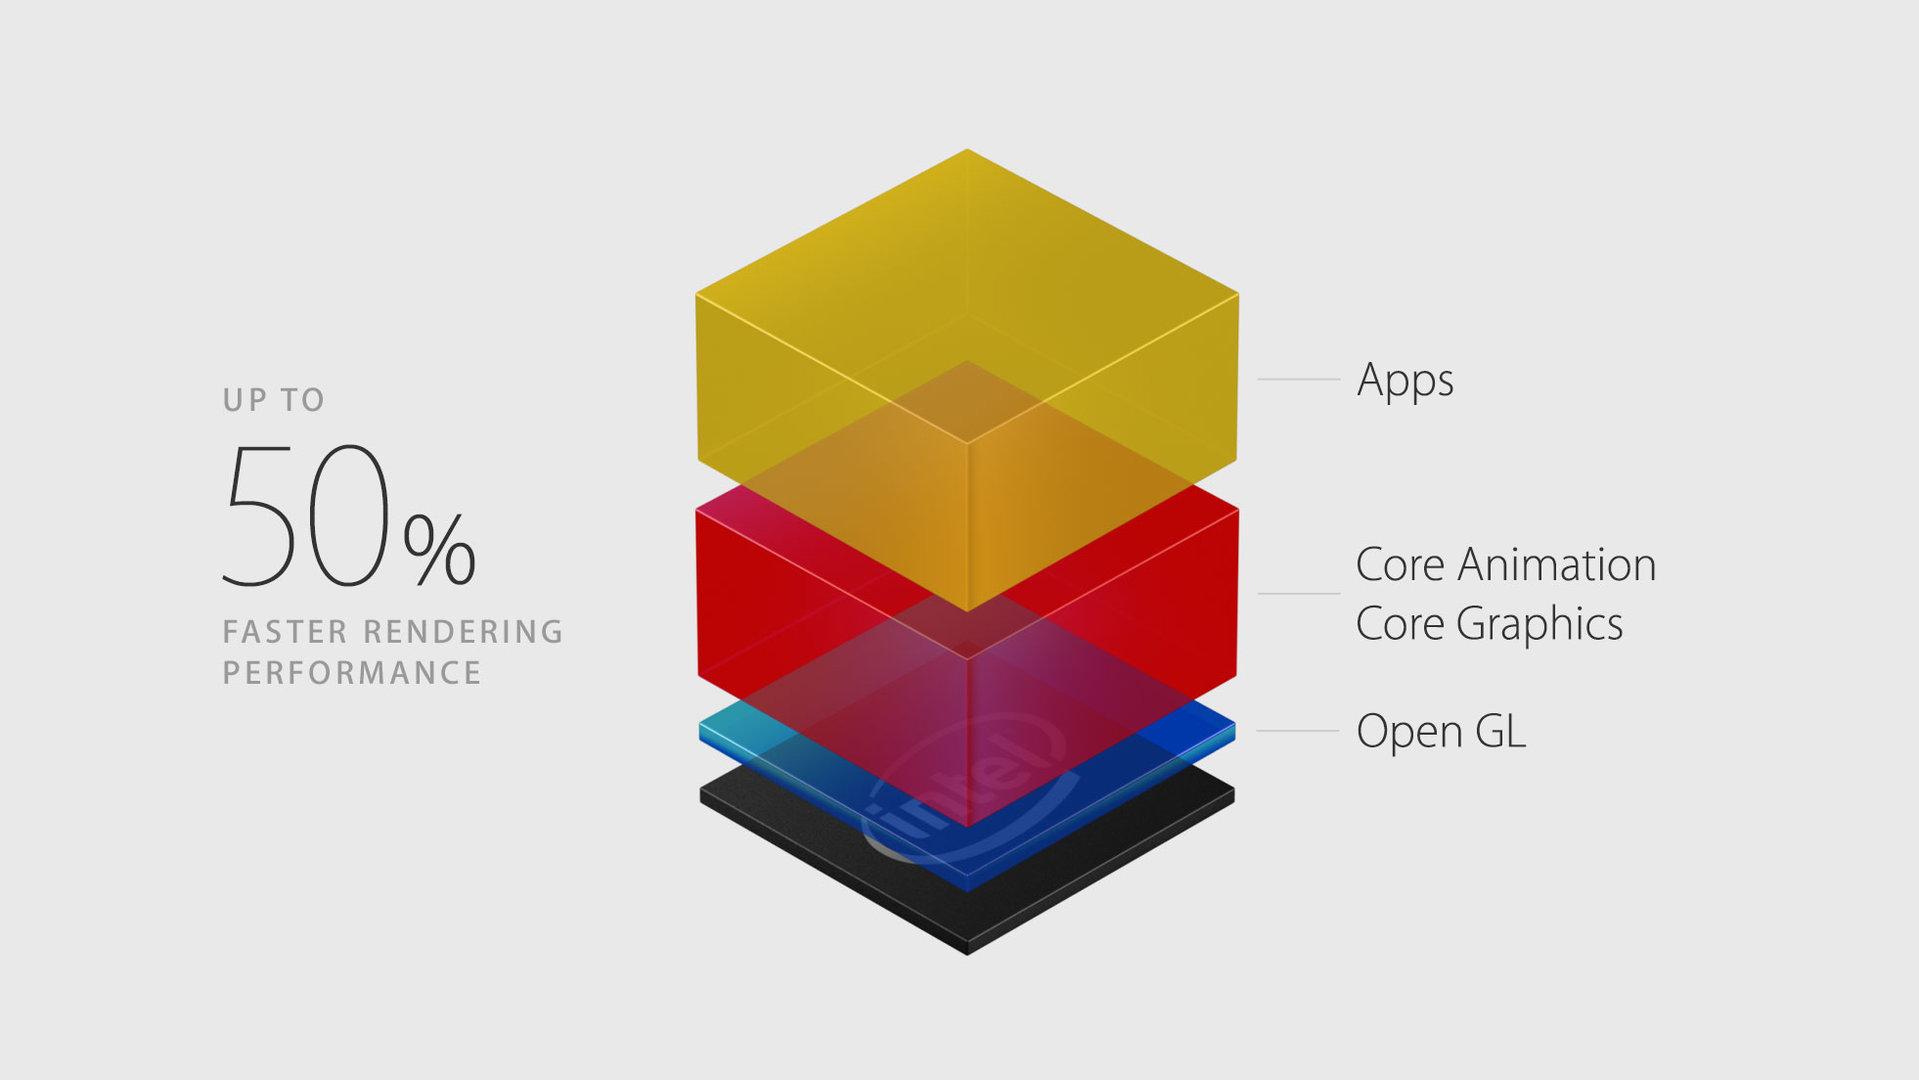 Die Low-Level-API Metal hält in OS X Einzug